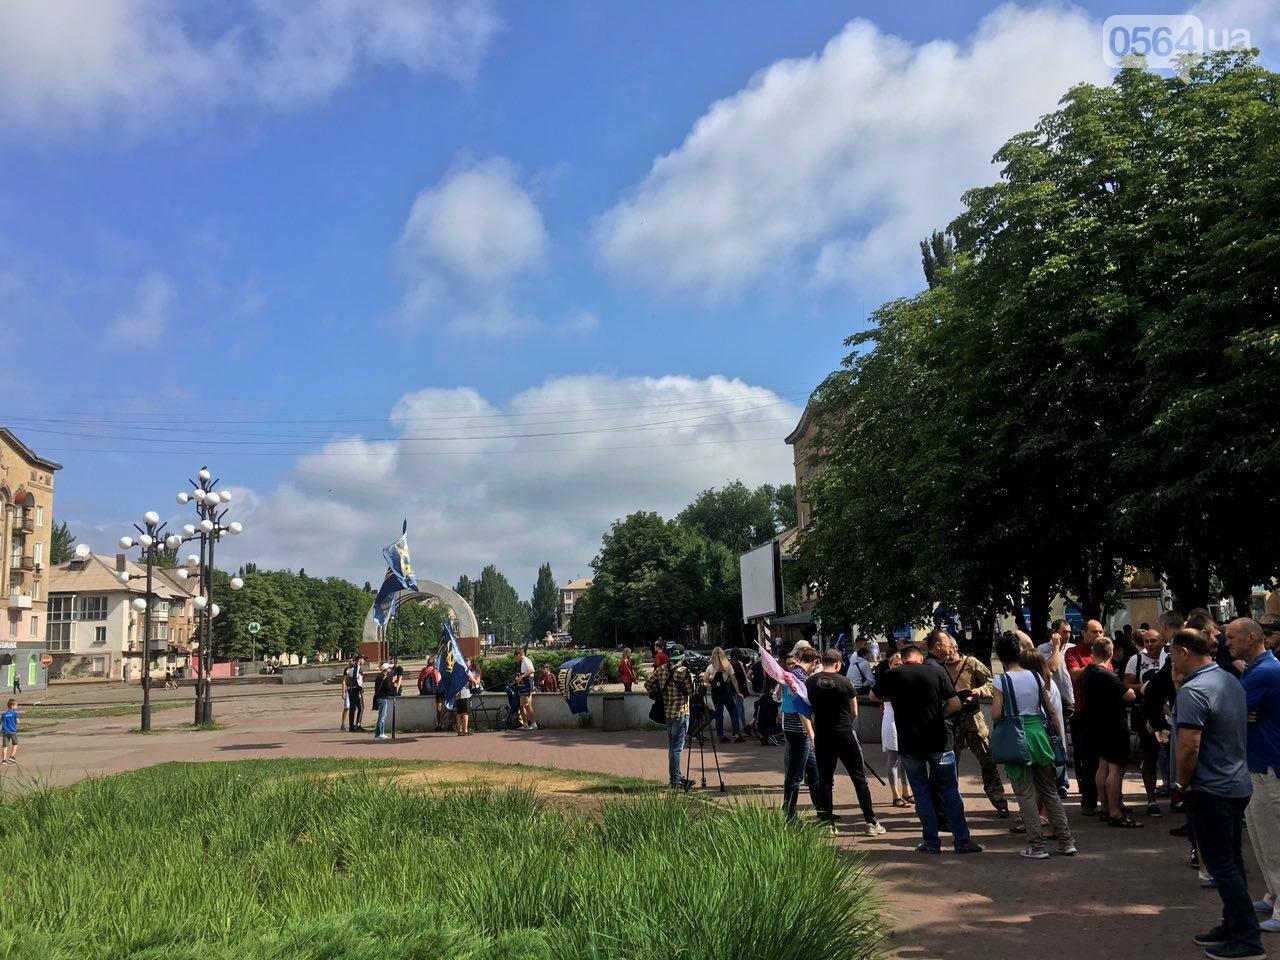 Трубят рога: В Кривом Роге собрались противники ЛГБТ-движения, - ФОТО, ВИДЕО, фото-7